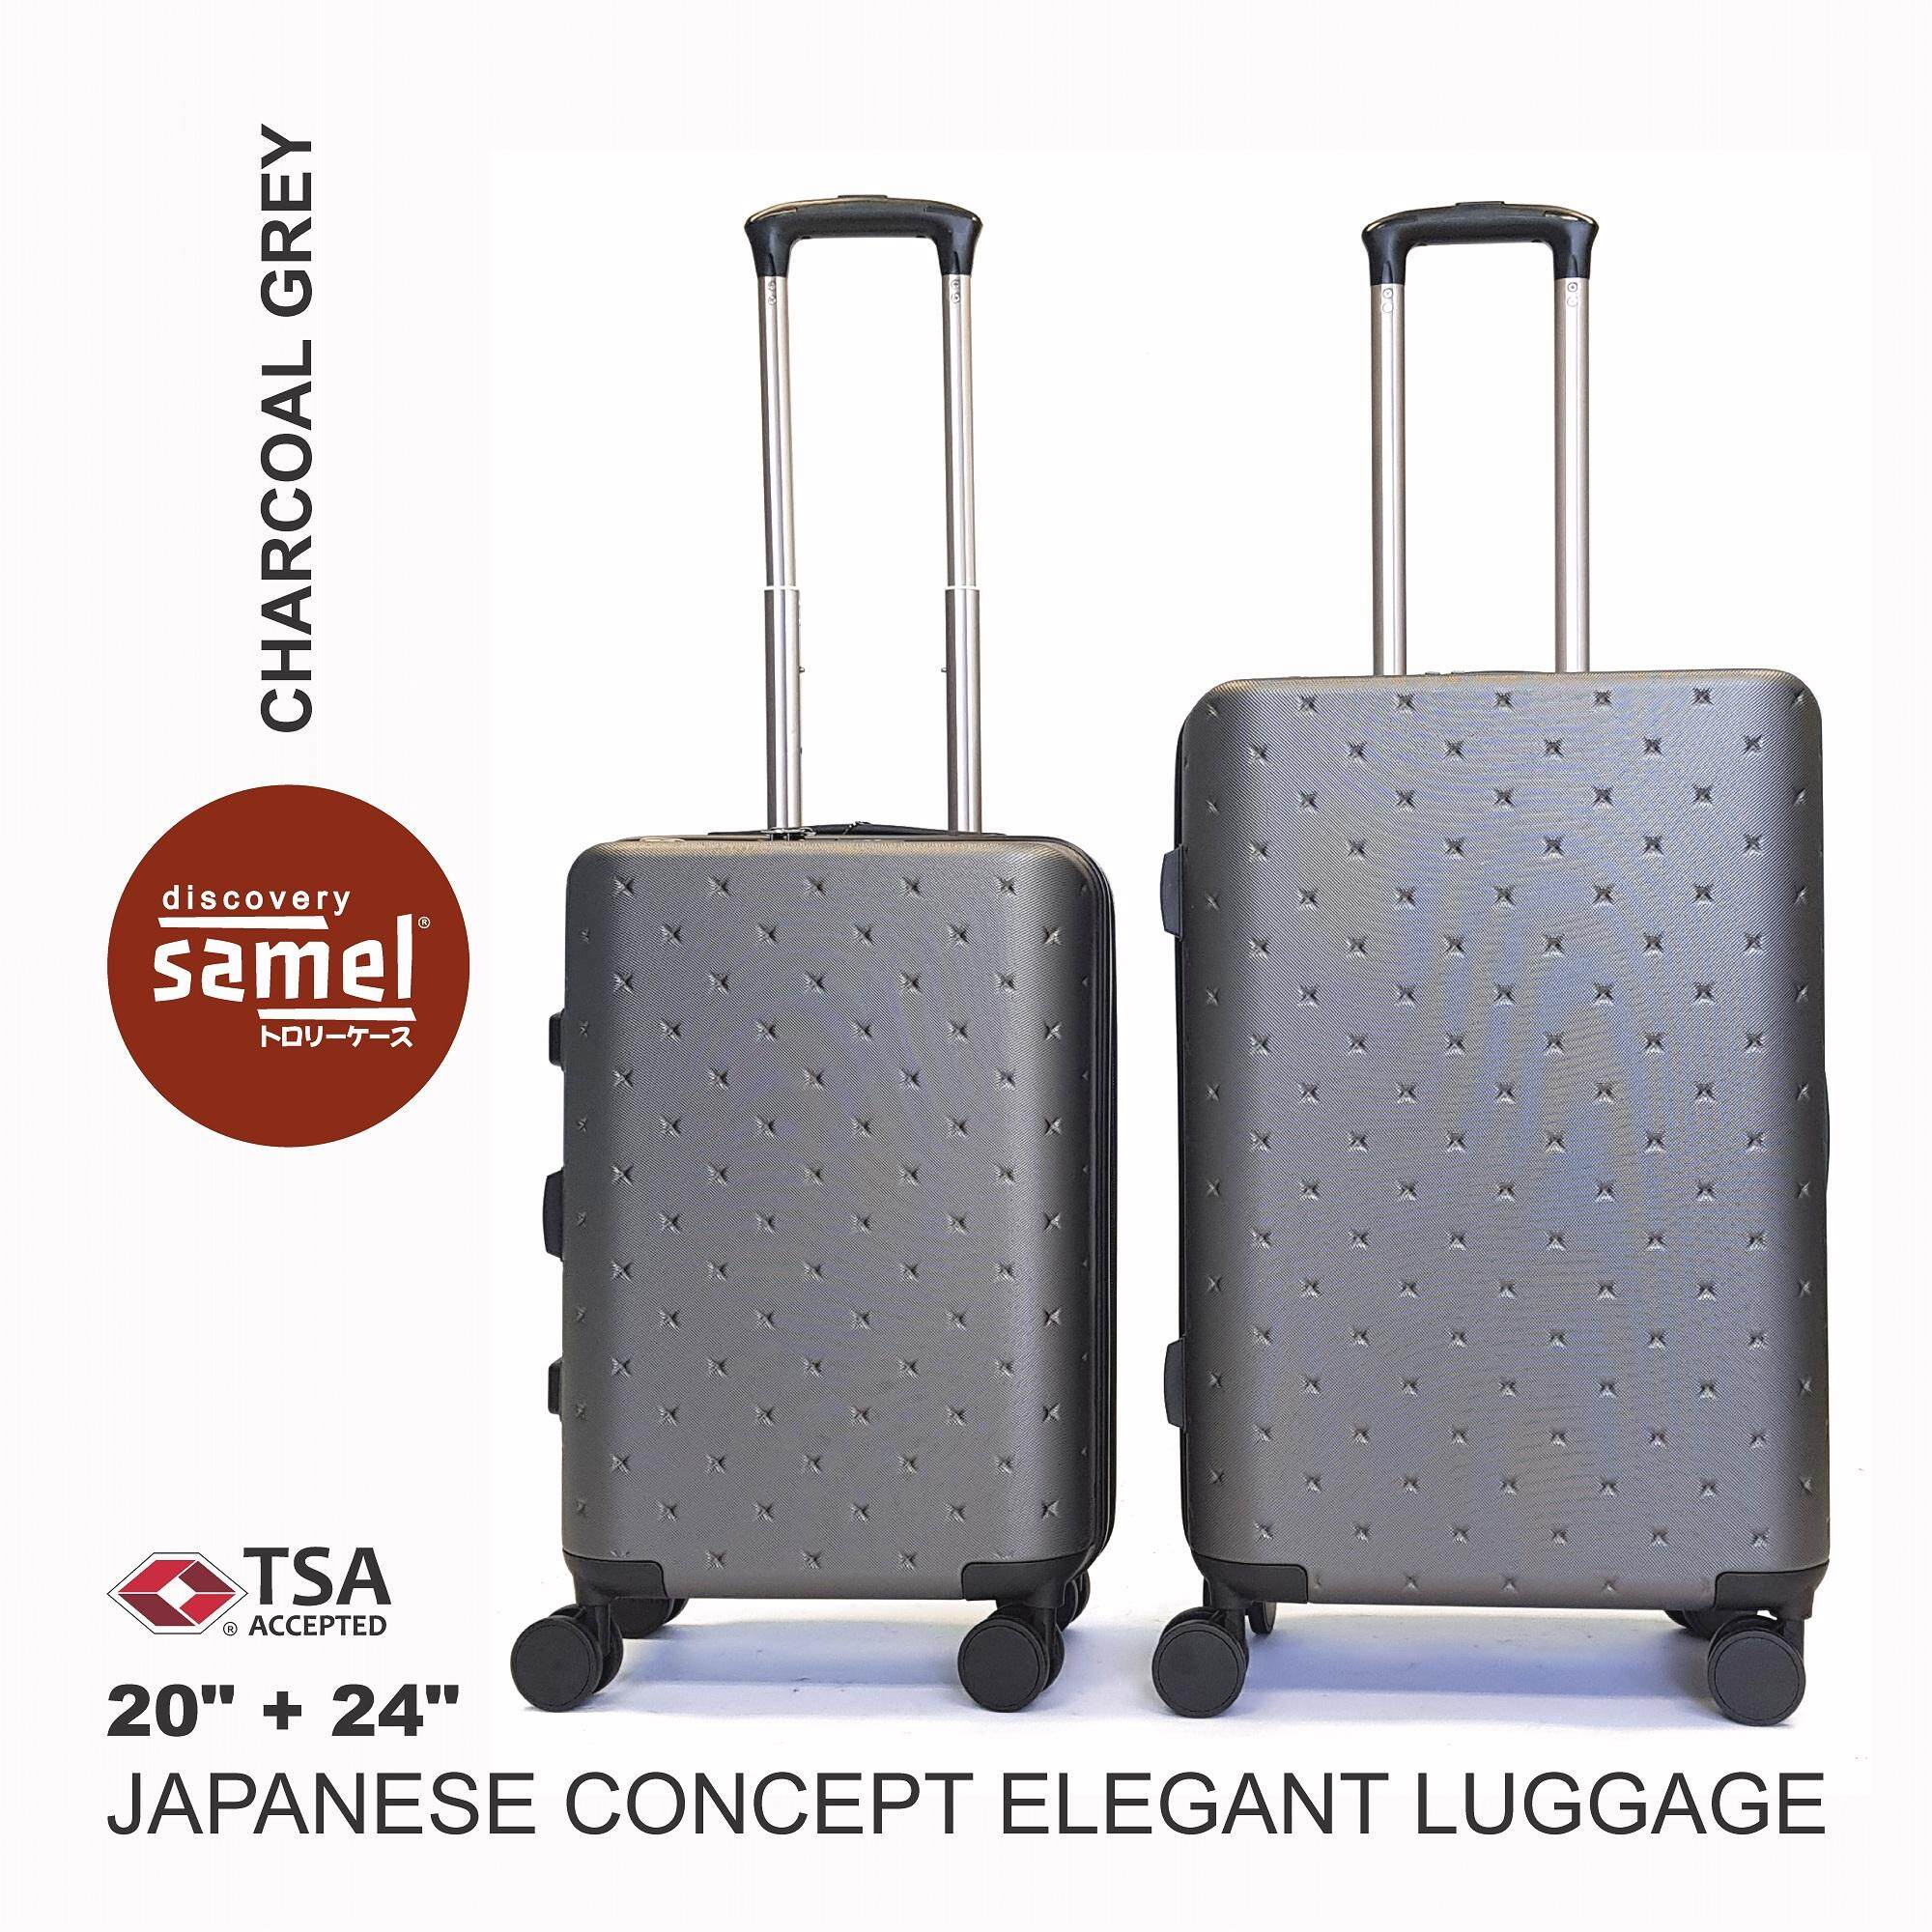 SAMEL FGD 309 JAPANESE CONCEPT ELEGANT LUGGAGE 2 IN 1